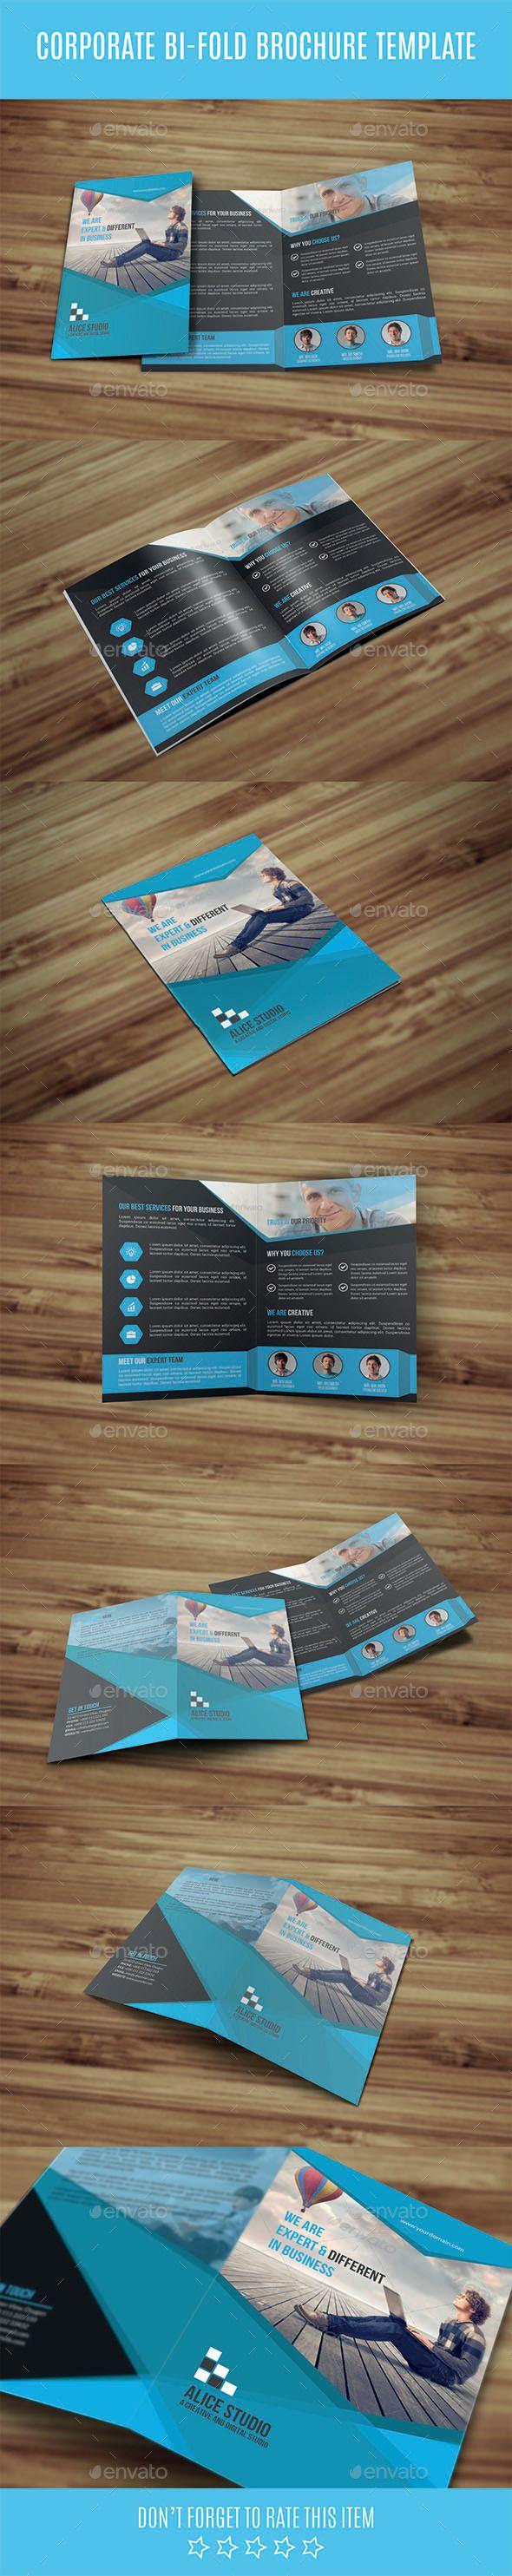 Corporate Bi-Fold Brochure Template - Corporate Brochure Template Vector EPS, Vector AI. Download here: http://graphicriver.net/item/corporate-bifold-brochure-template/12264193?s_rank=1706&ref=yinkira